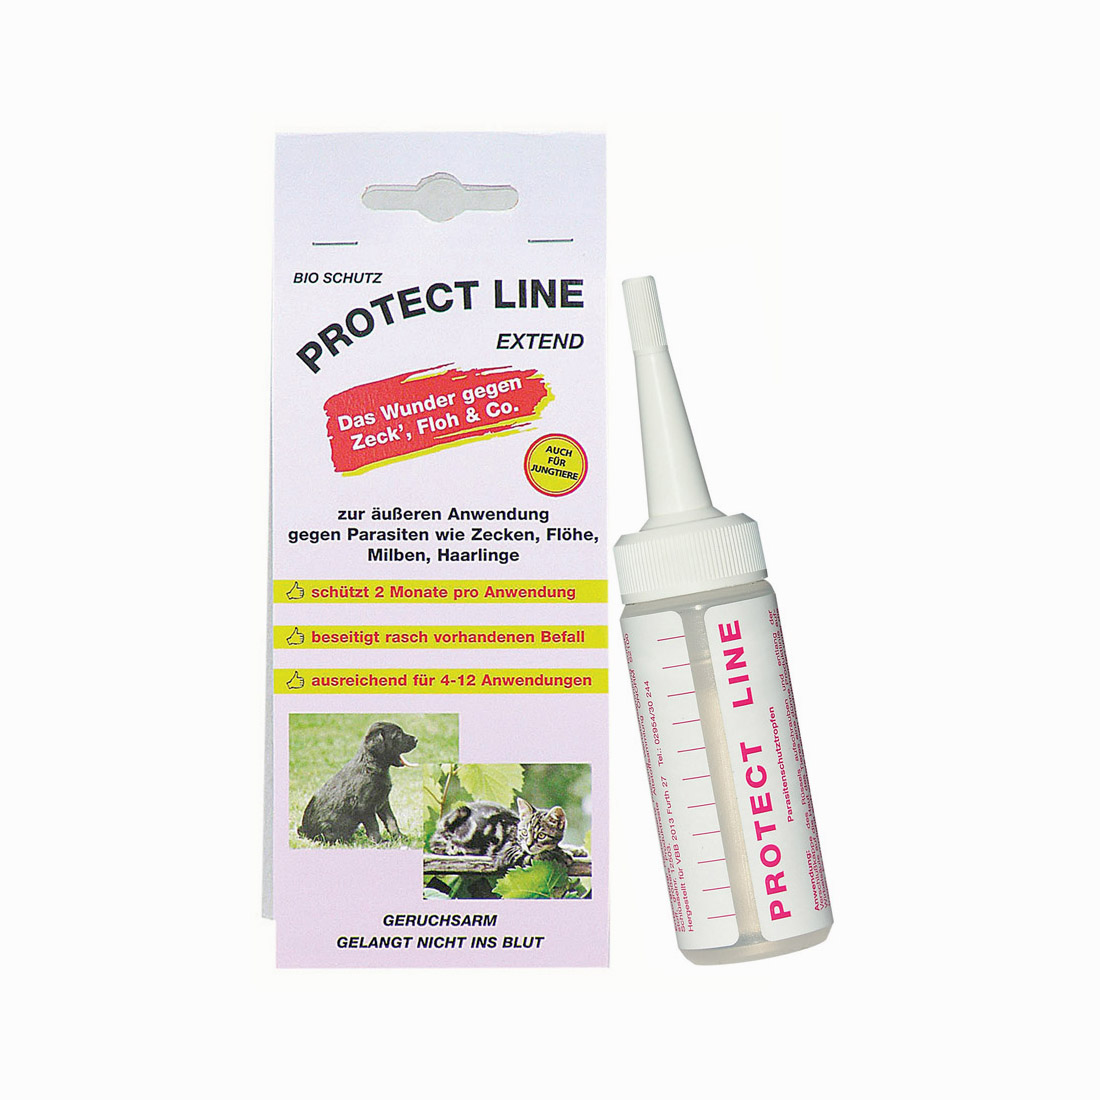 Bio Schutz Protect Line Extend